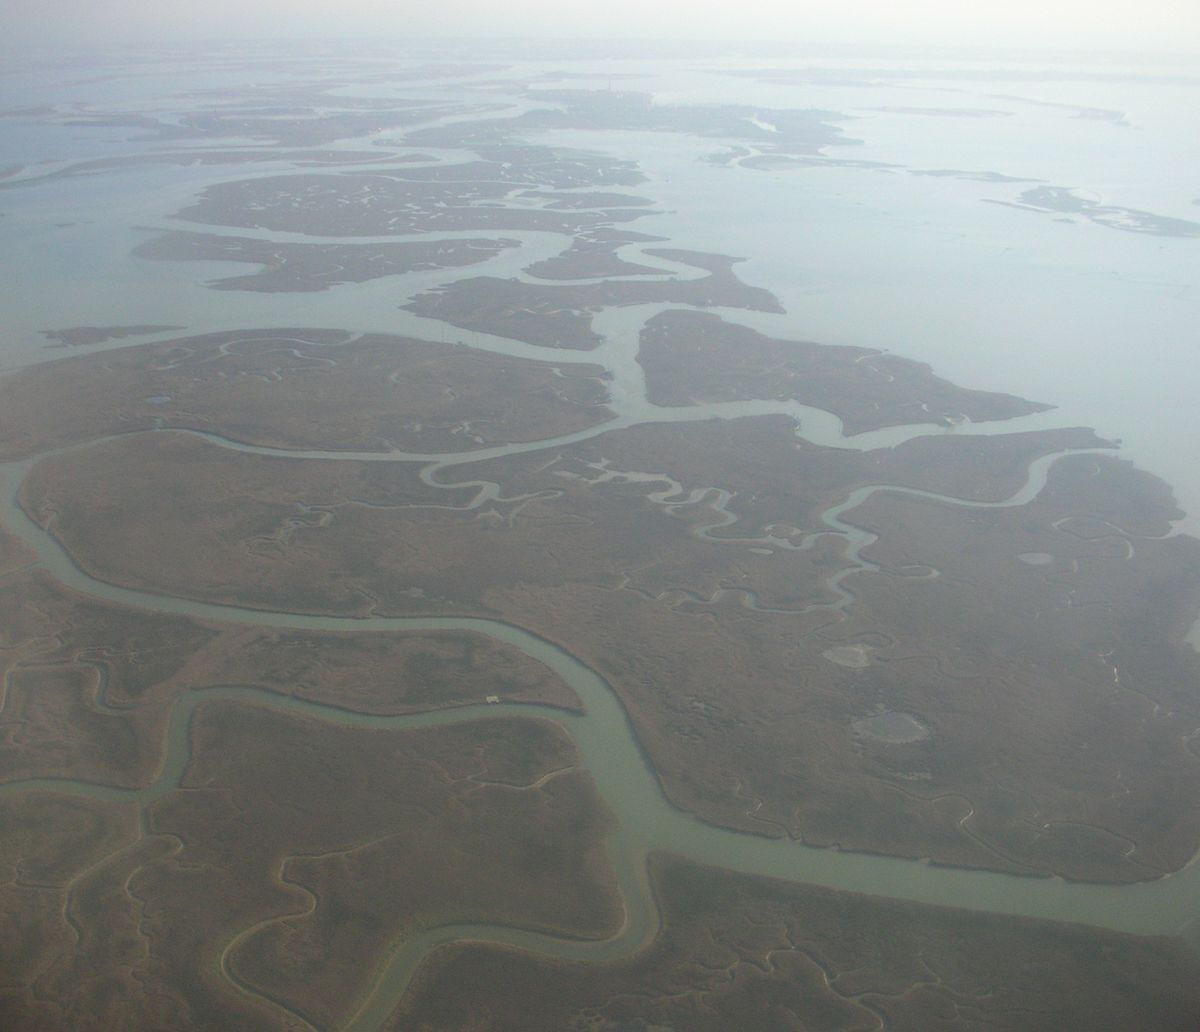 Venezia marittima  Wikipedia